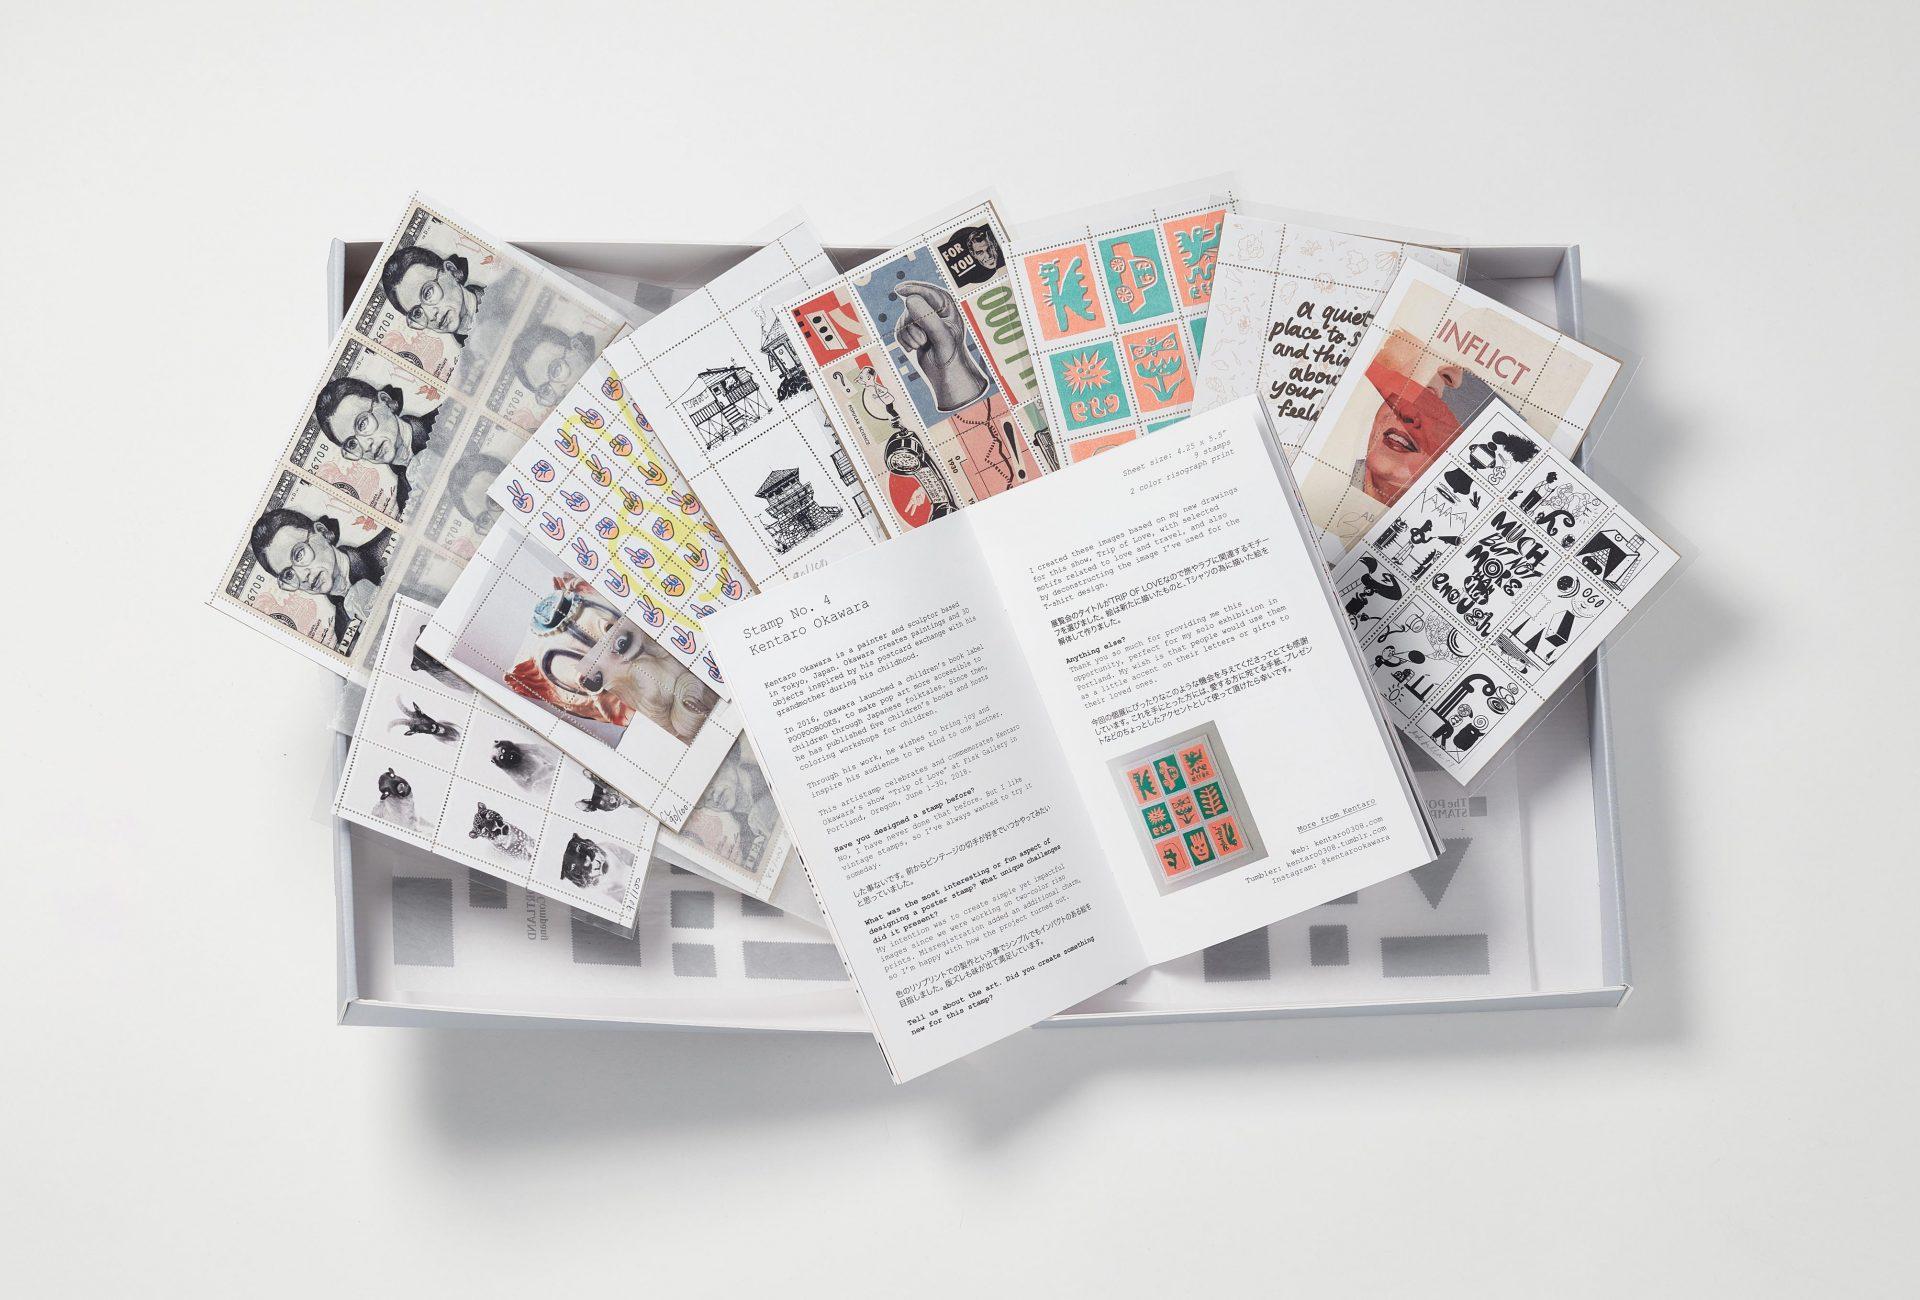 portland-stamp-company-artist-series-1-10-open